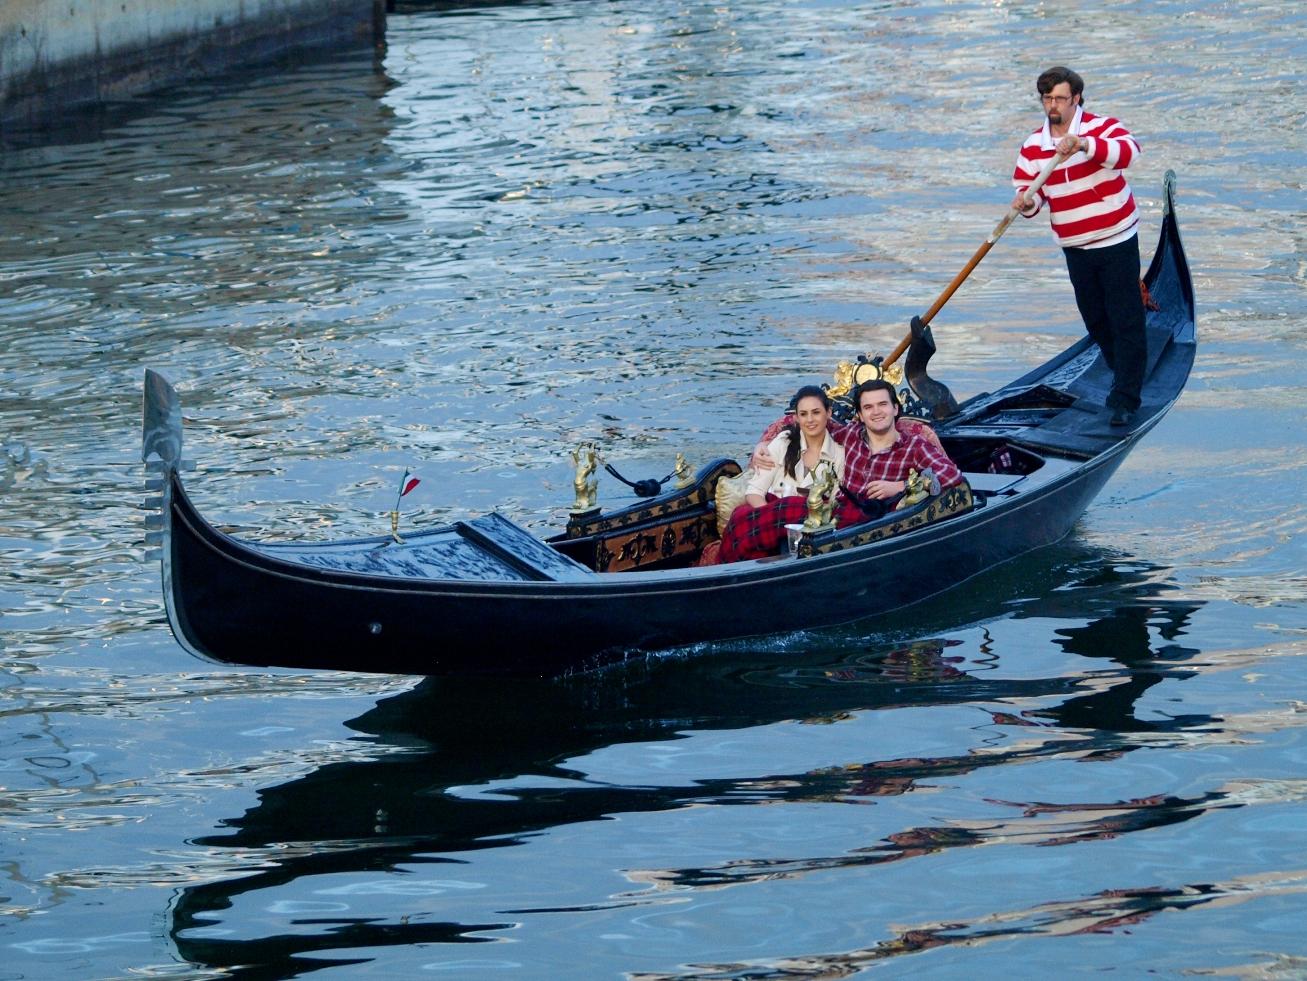 Gondola Ride Newport Beach The Best Beaches In World